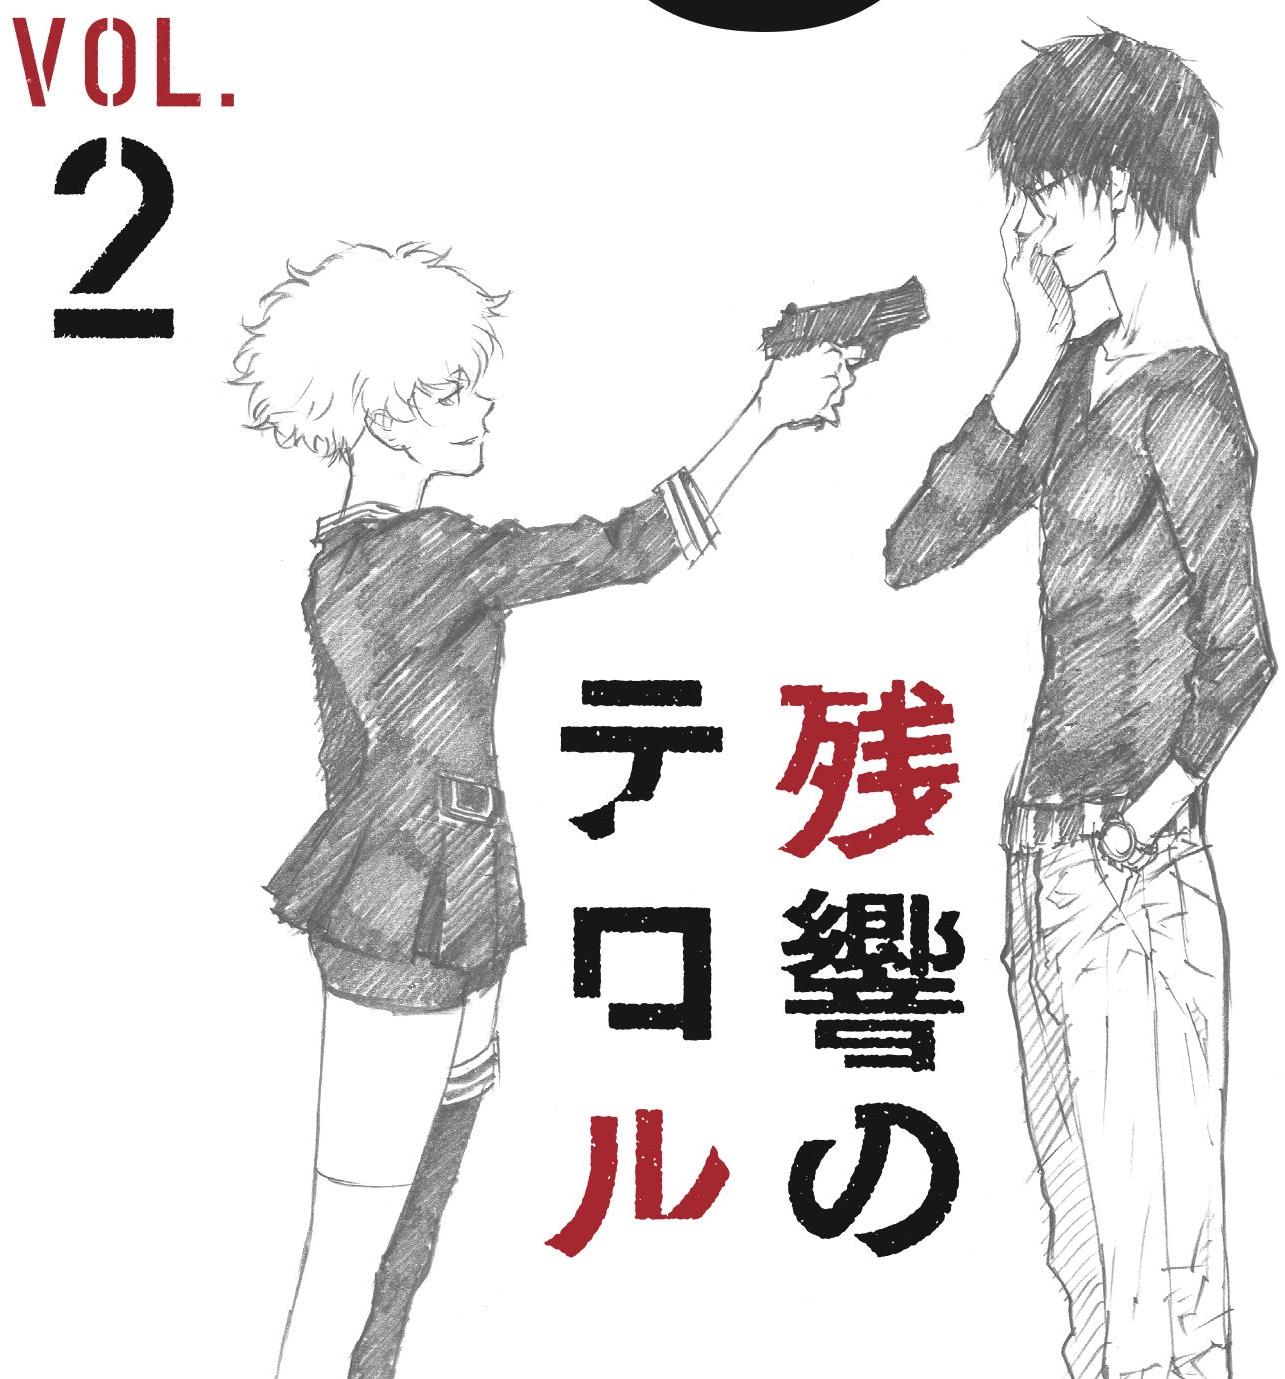 Terror_in_Tokio_Vol_2_BD_Limited_Special_Edition_Bluray_888750153098_2D.72dpi